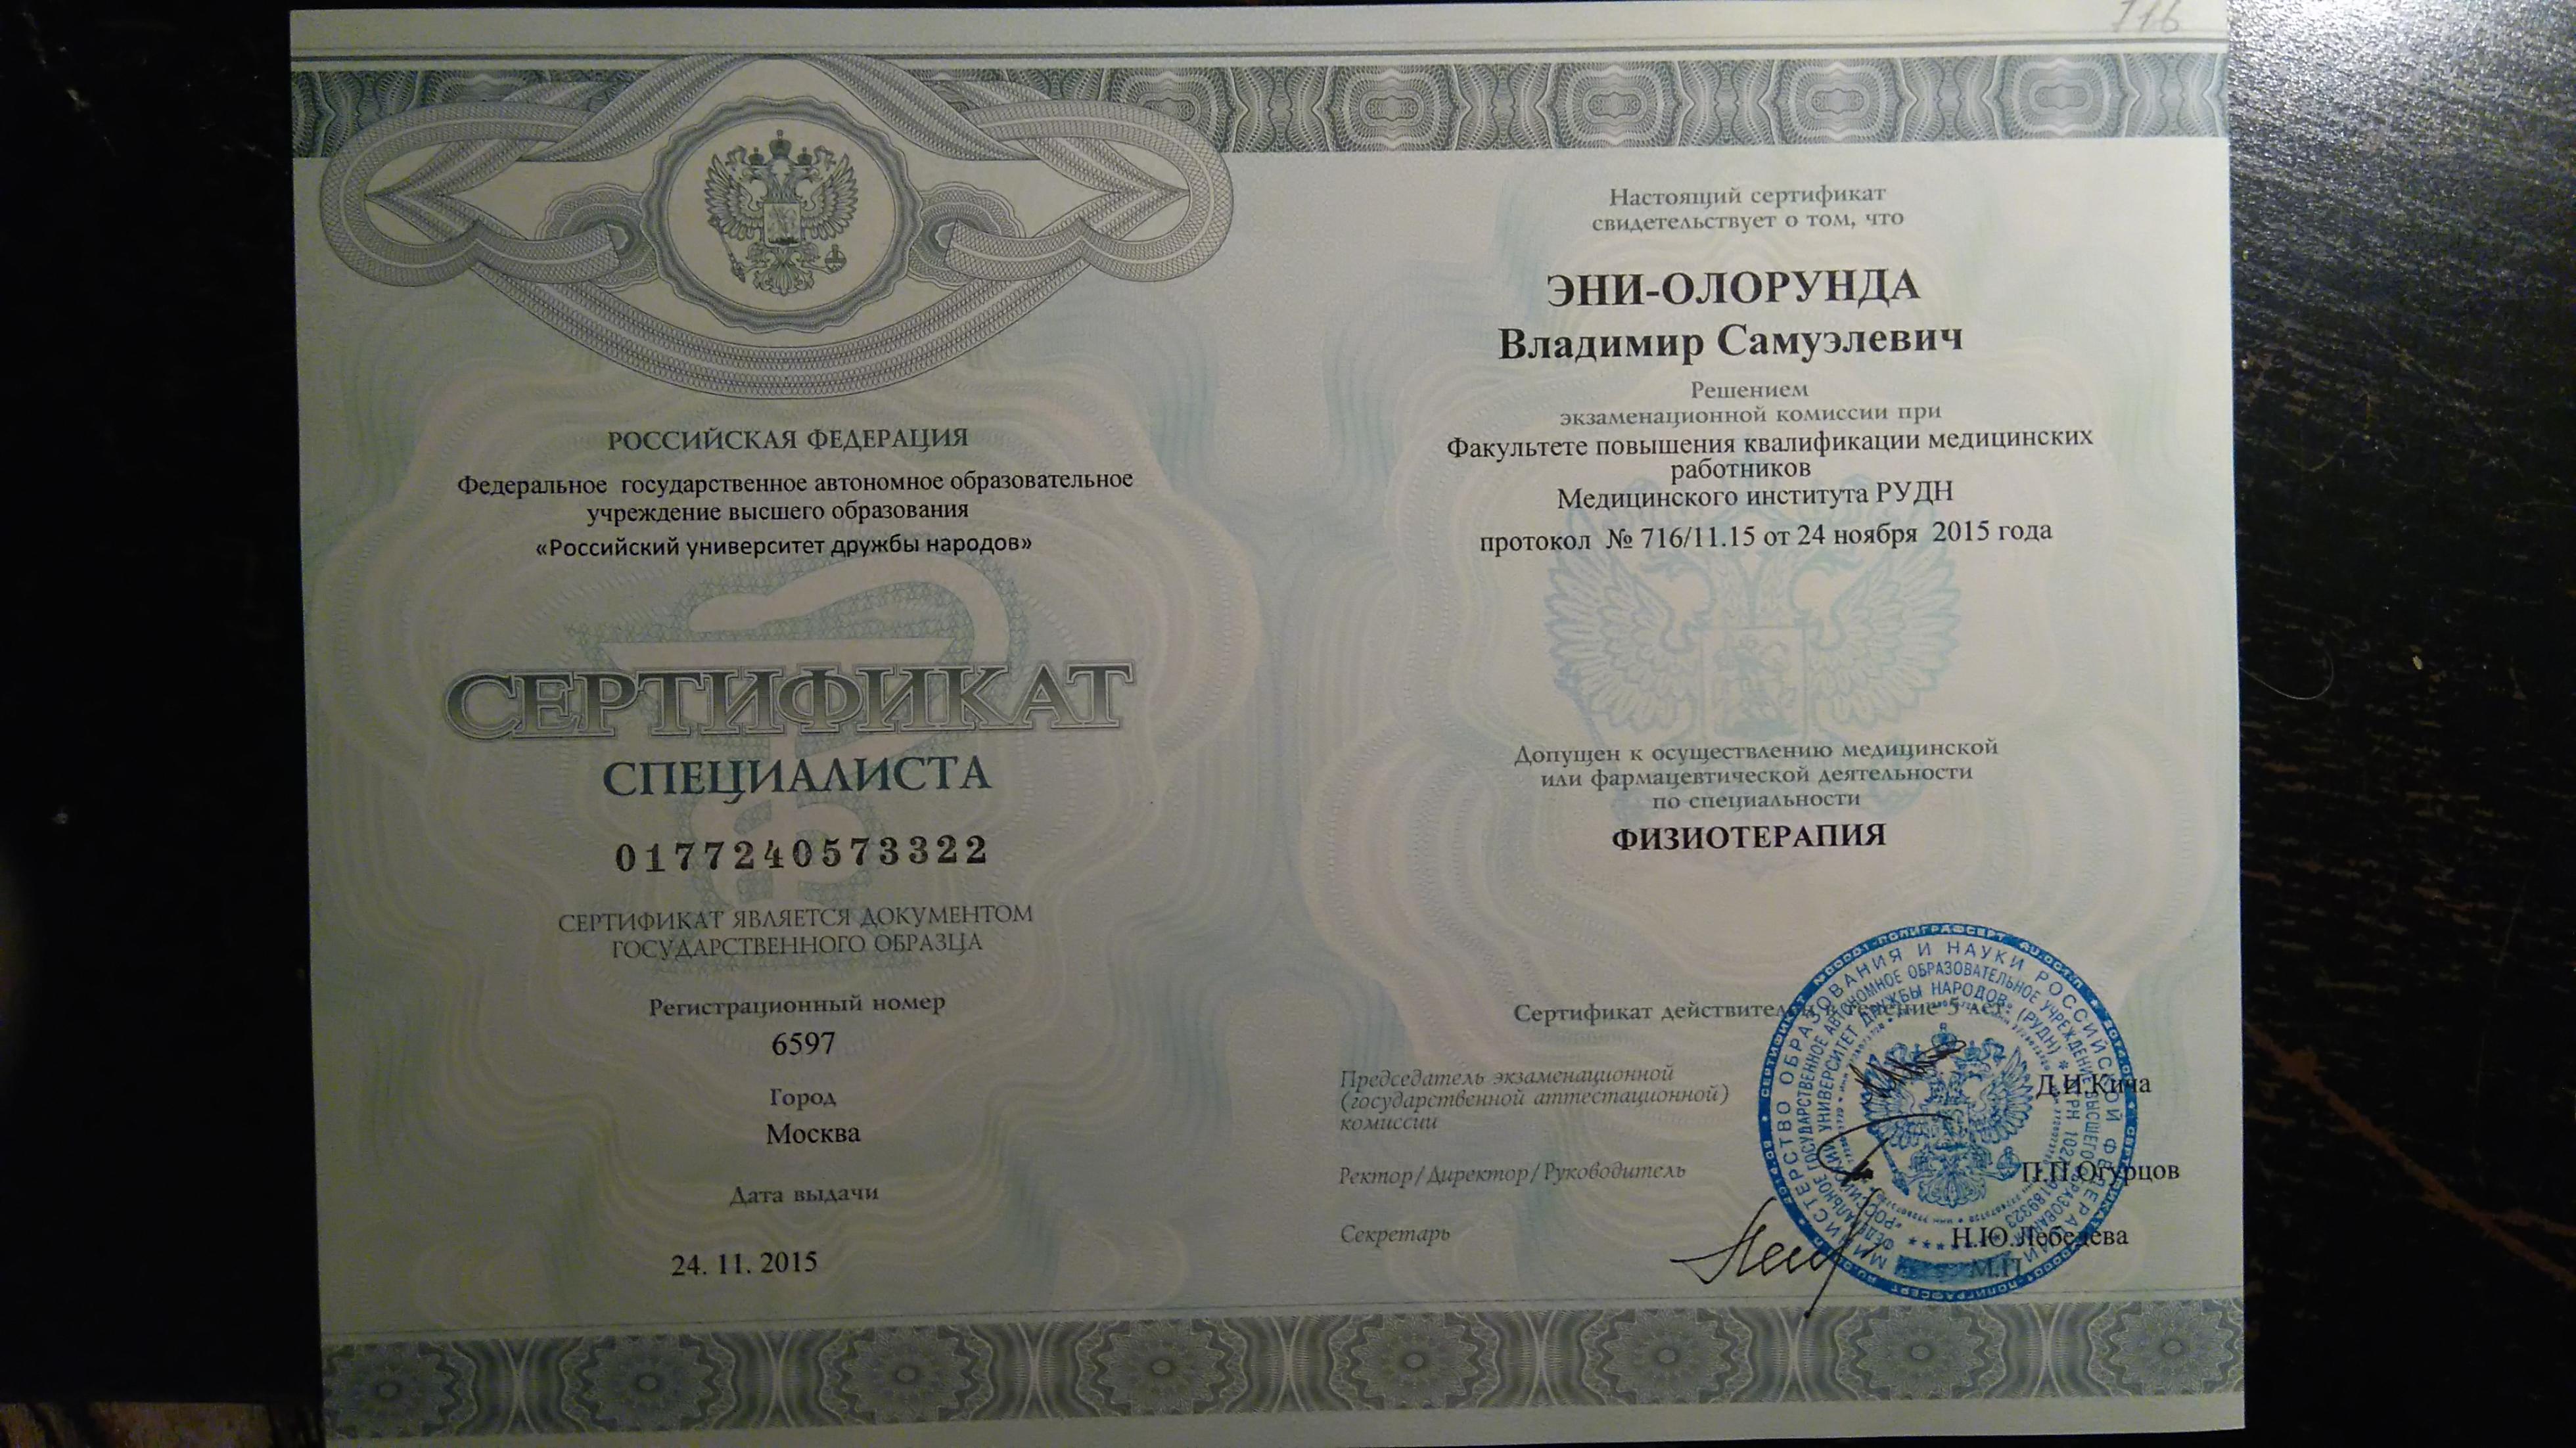 Сертификат по физиотерапии